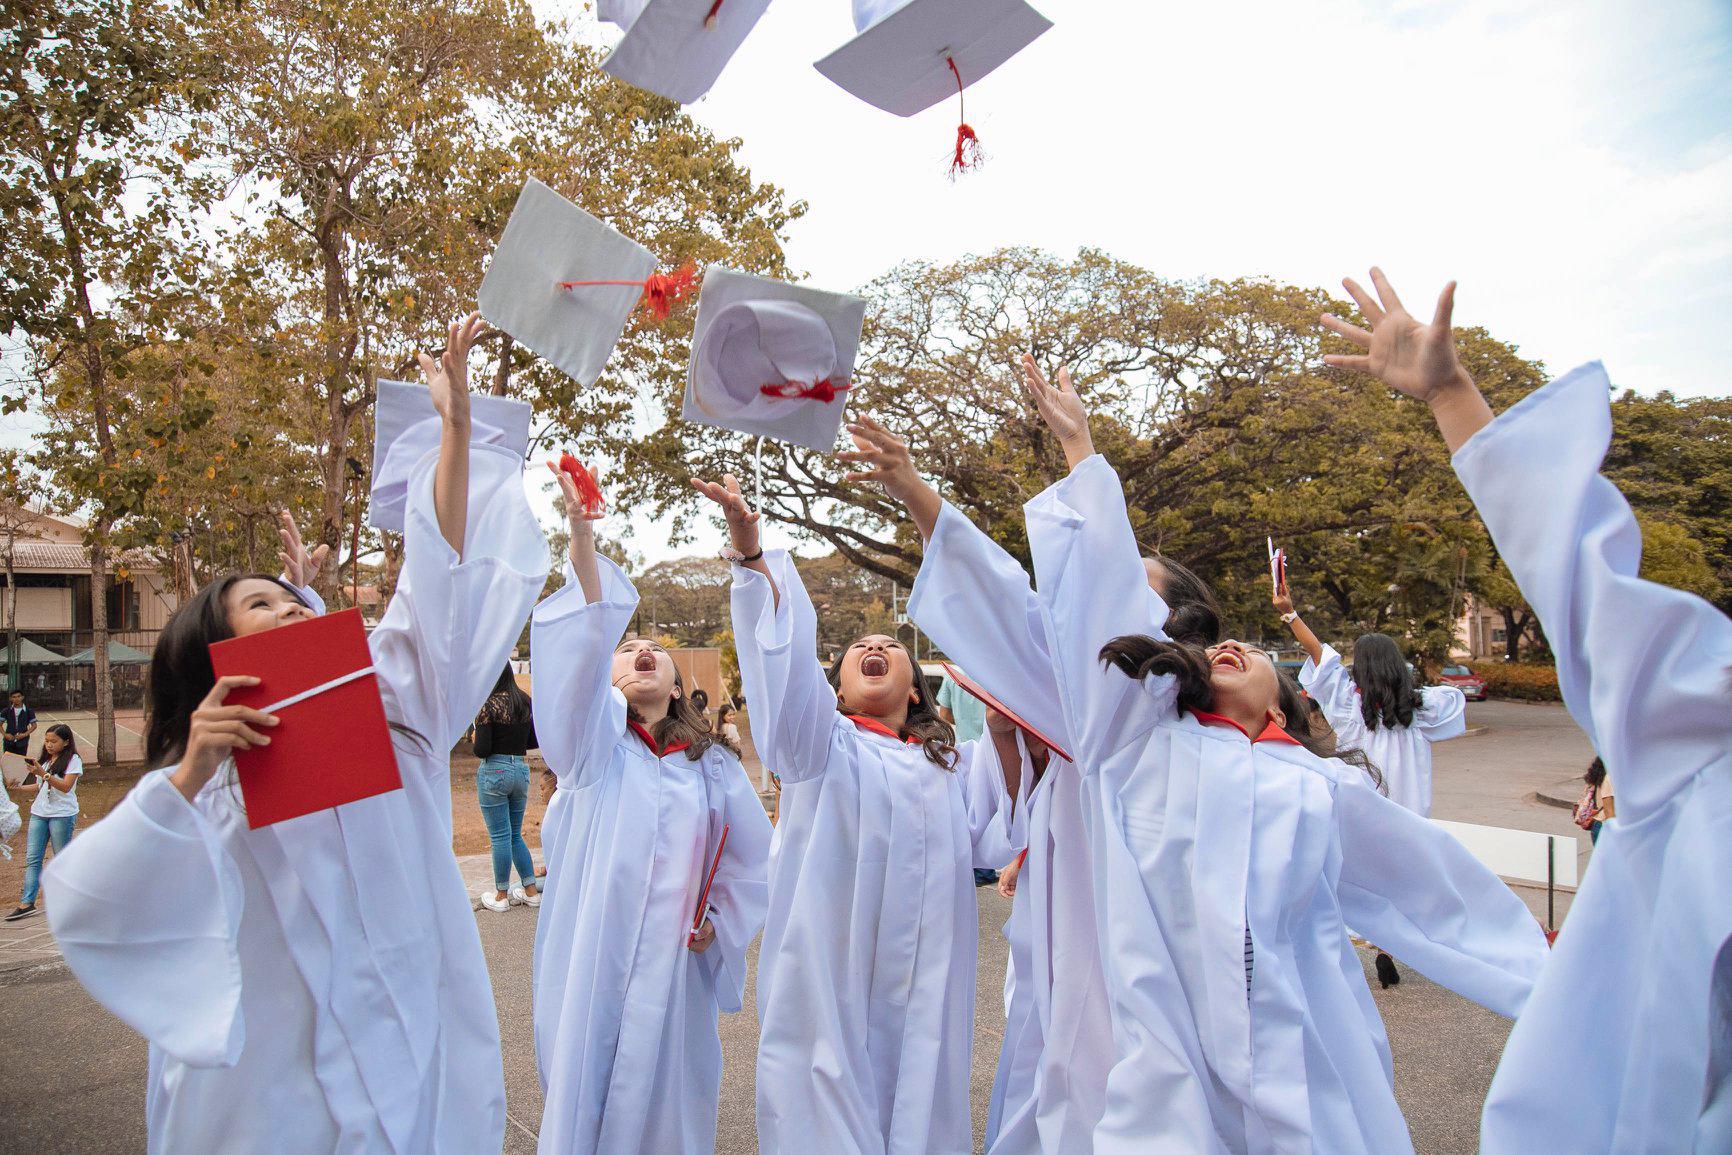 SU Elementary School names 174 candidates for graduation